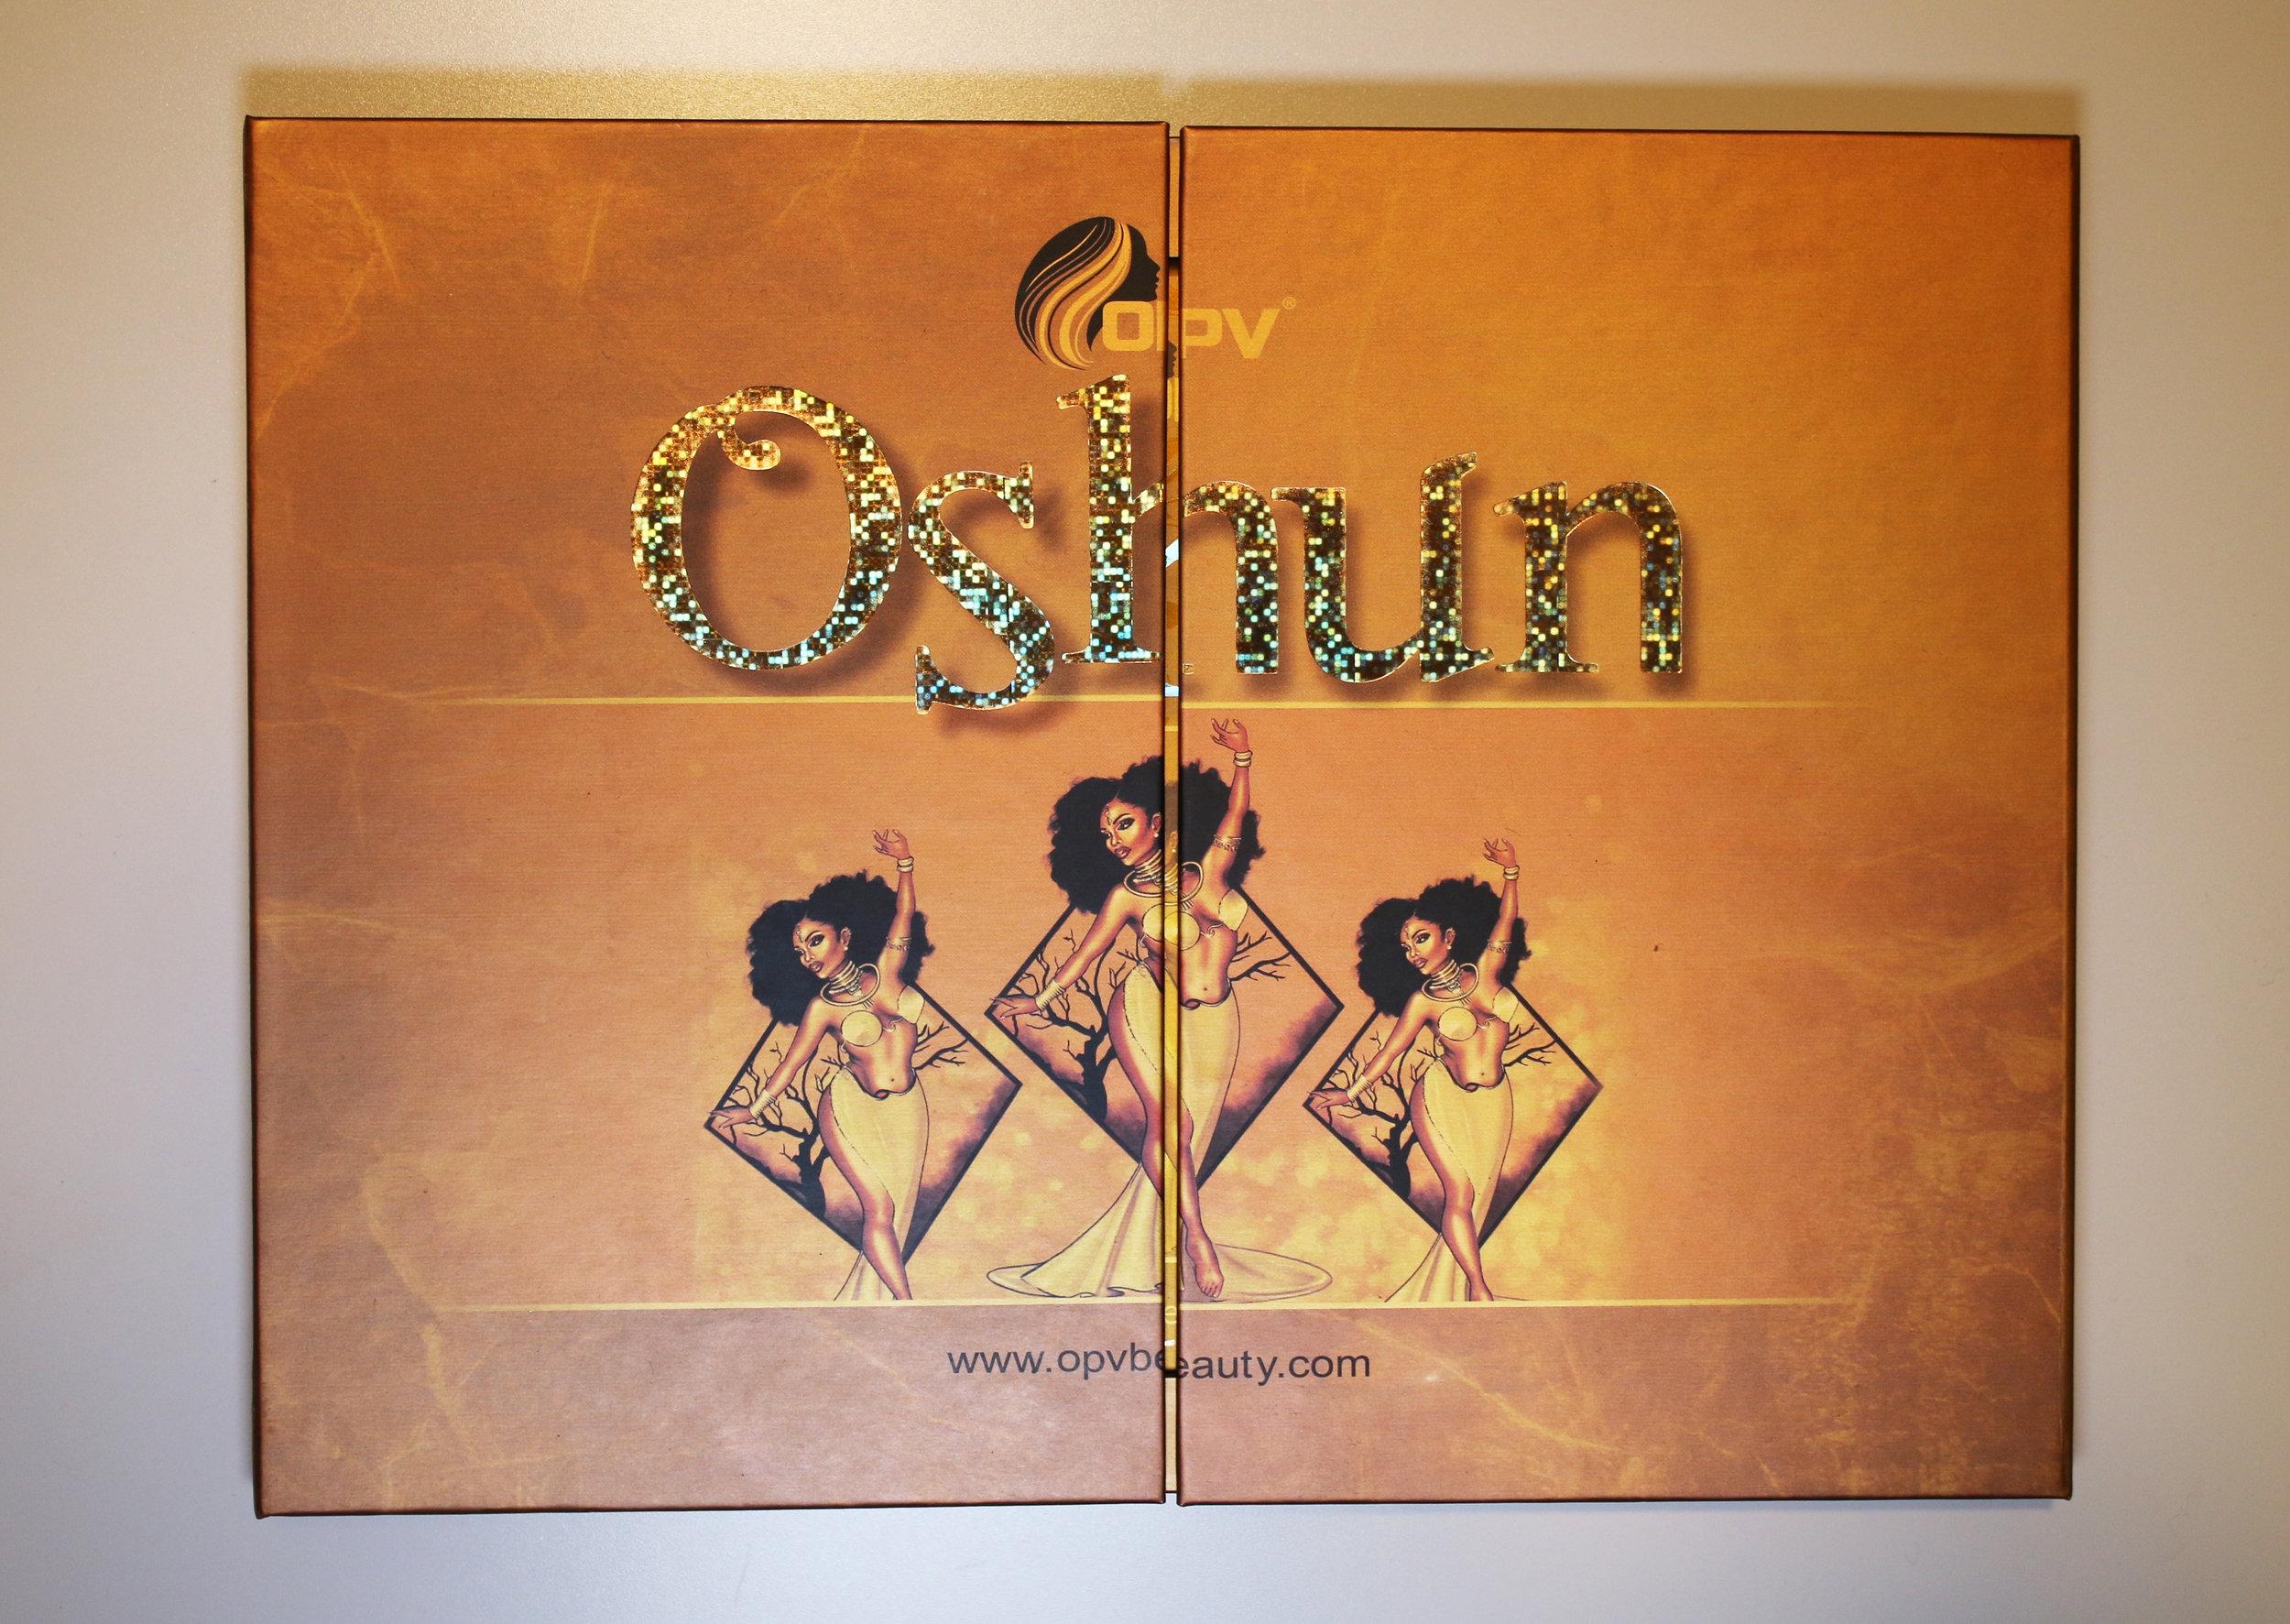 OPV Beauty Oshun Palette Candy Coated Closets.jpg